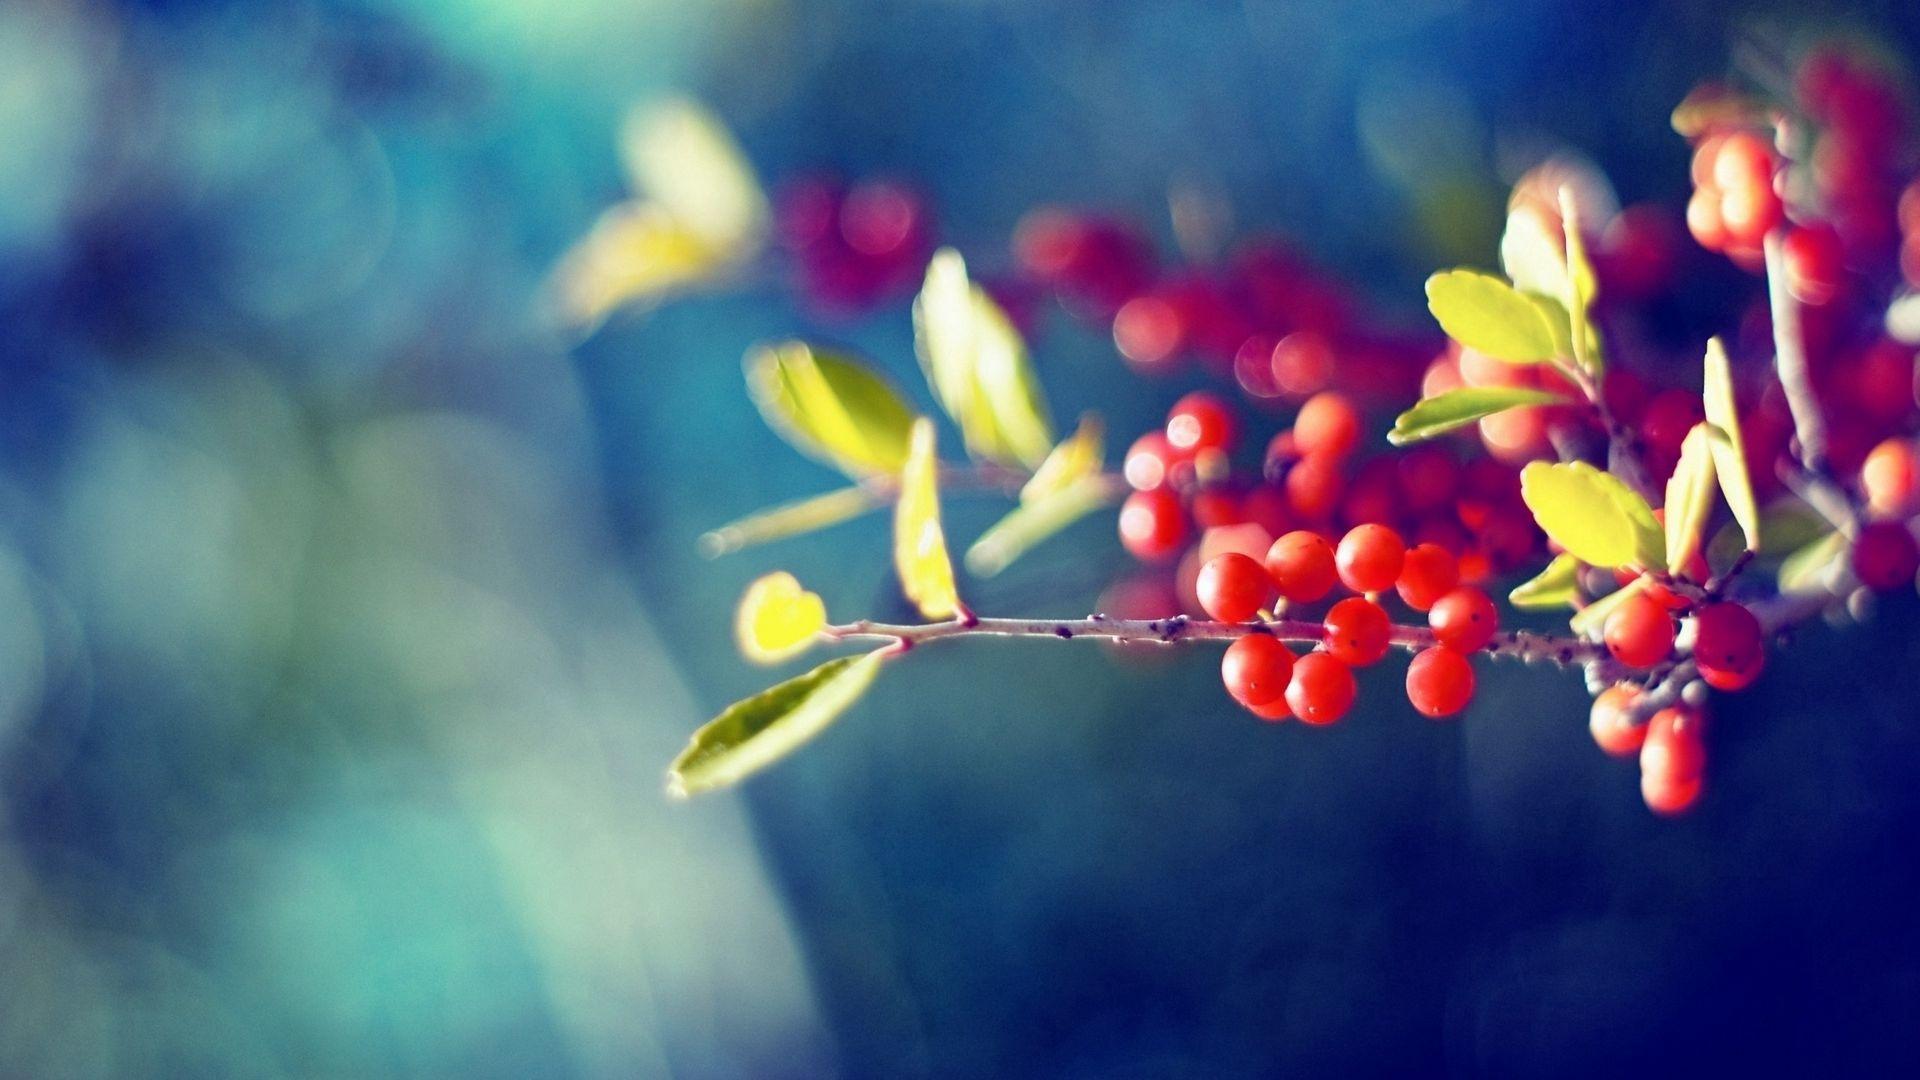 Berries On A Branch desktop wallpaper free download